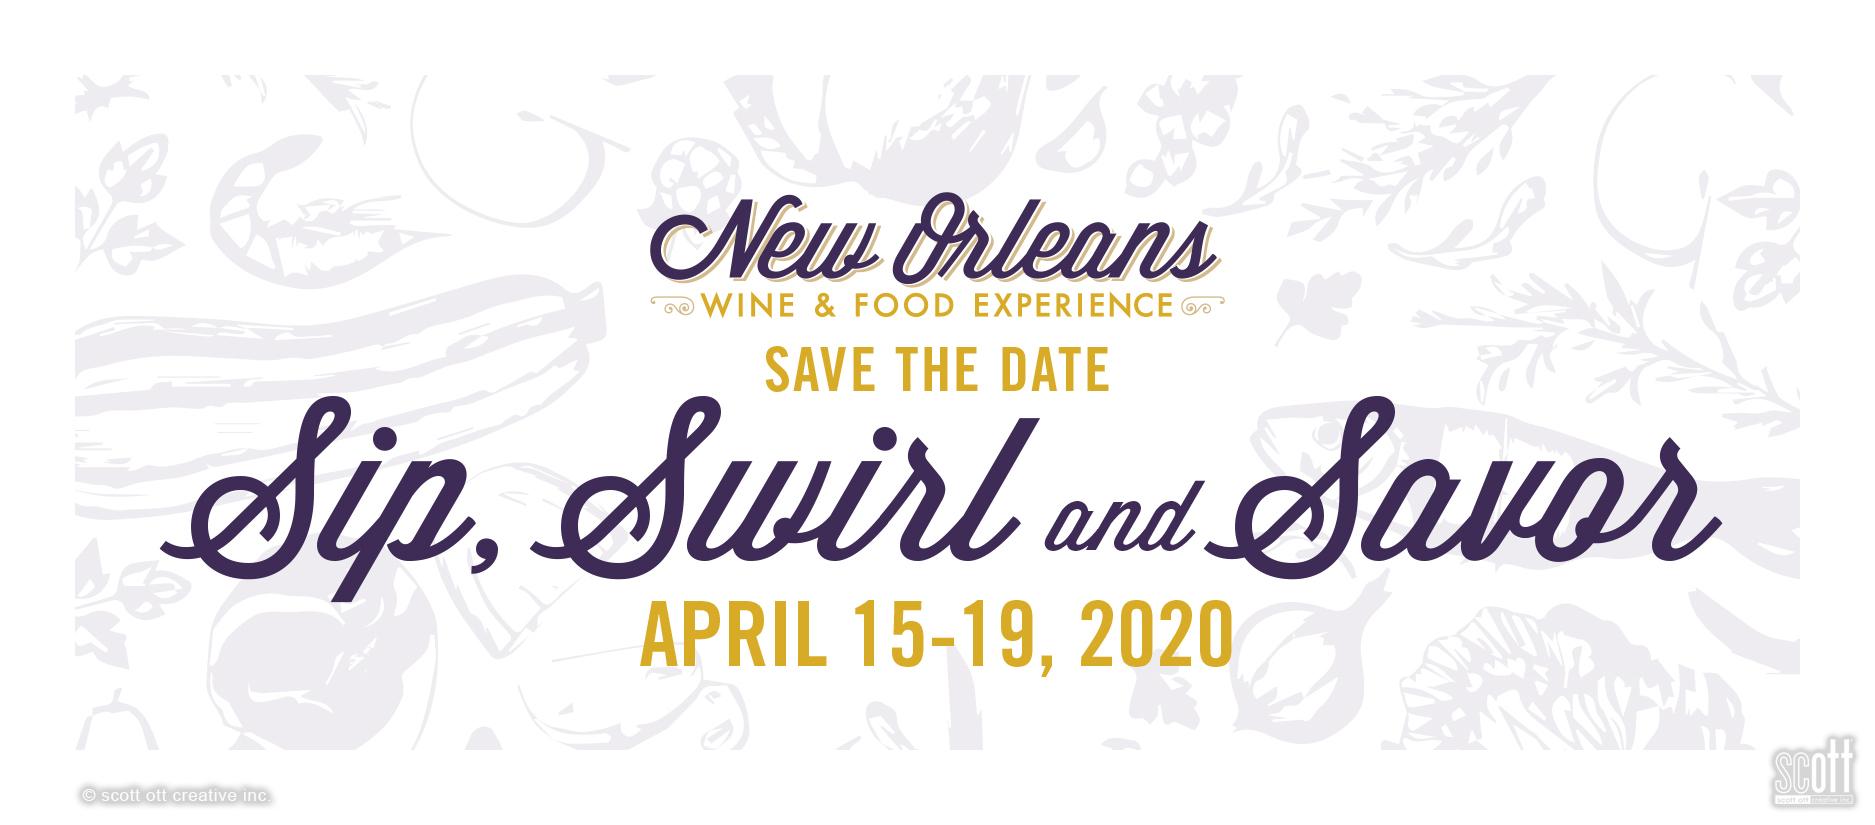 NOWFE 2020 SAVE THE DATE 1 - scott ott c